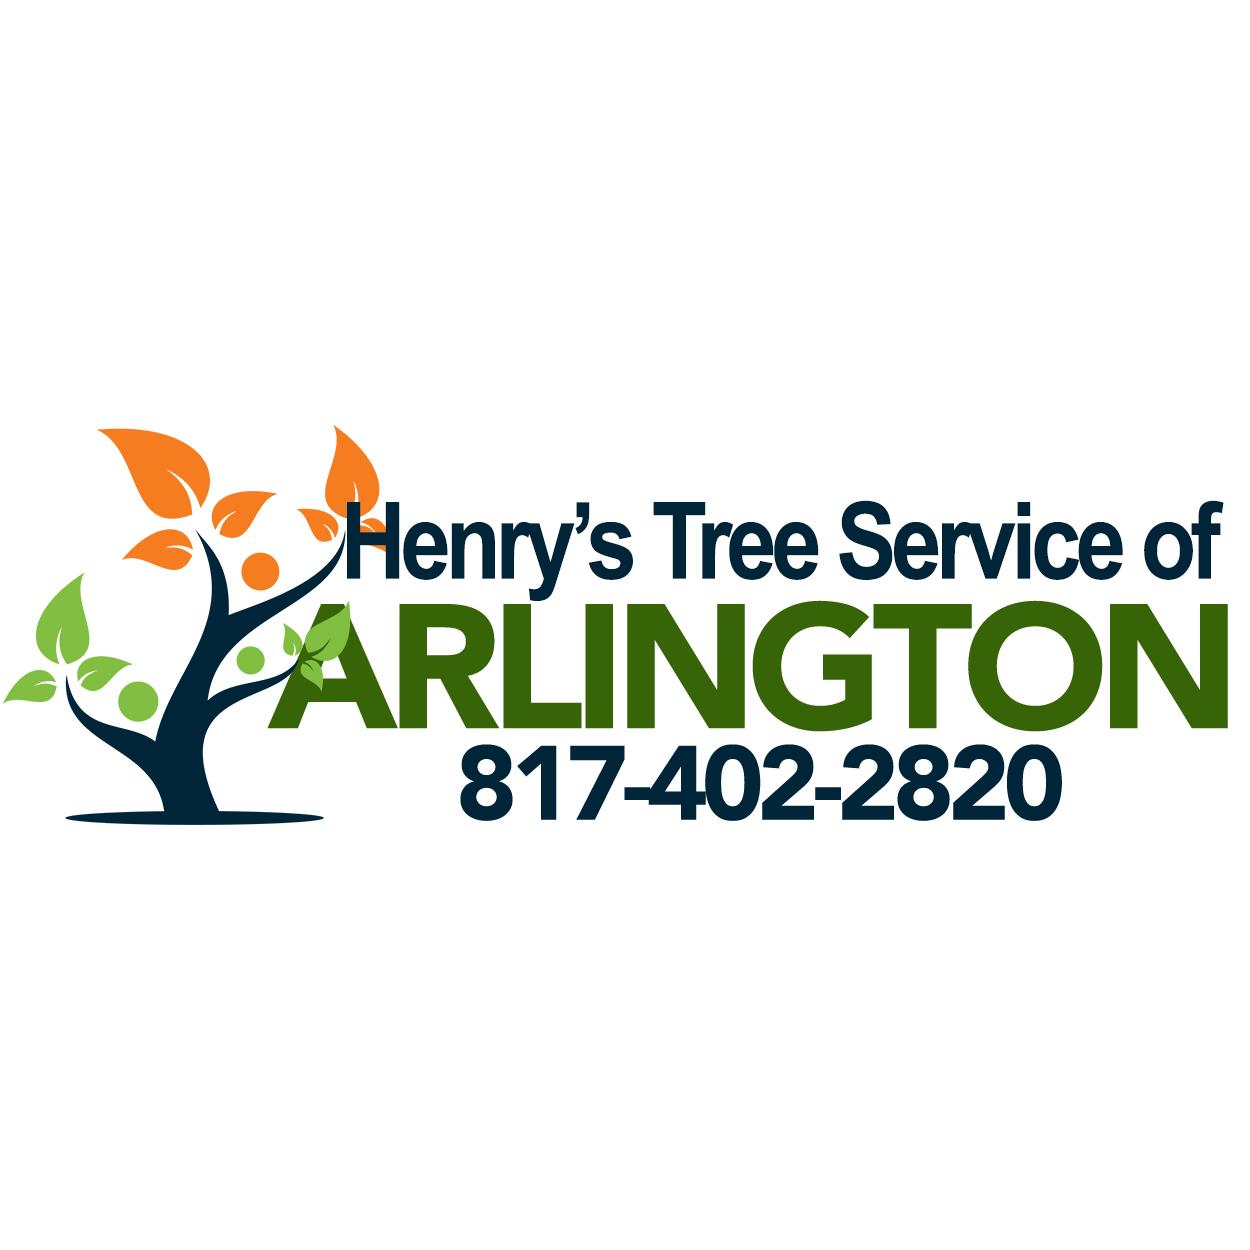 Henry's Tree Service of Arlington